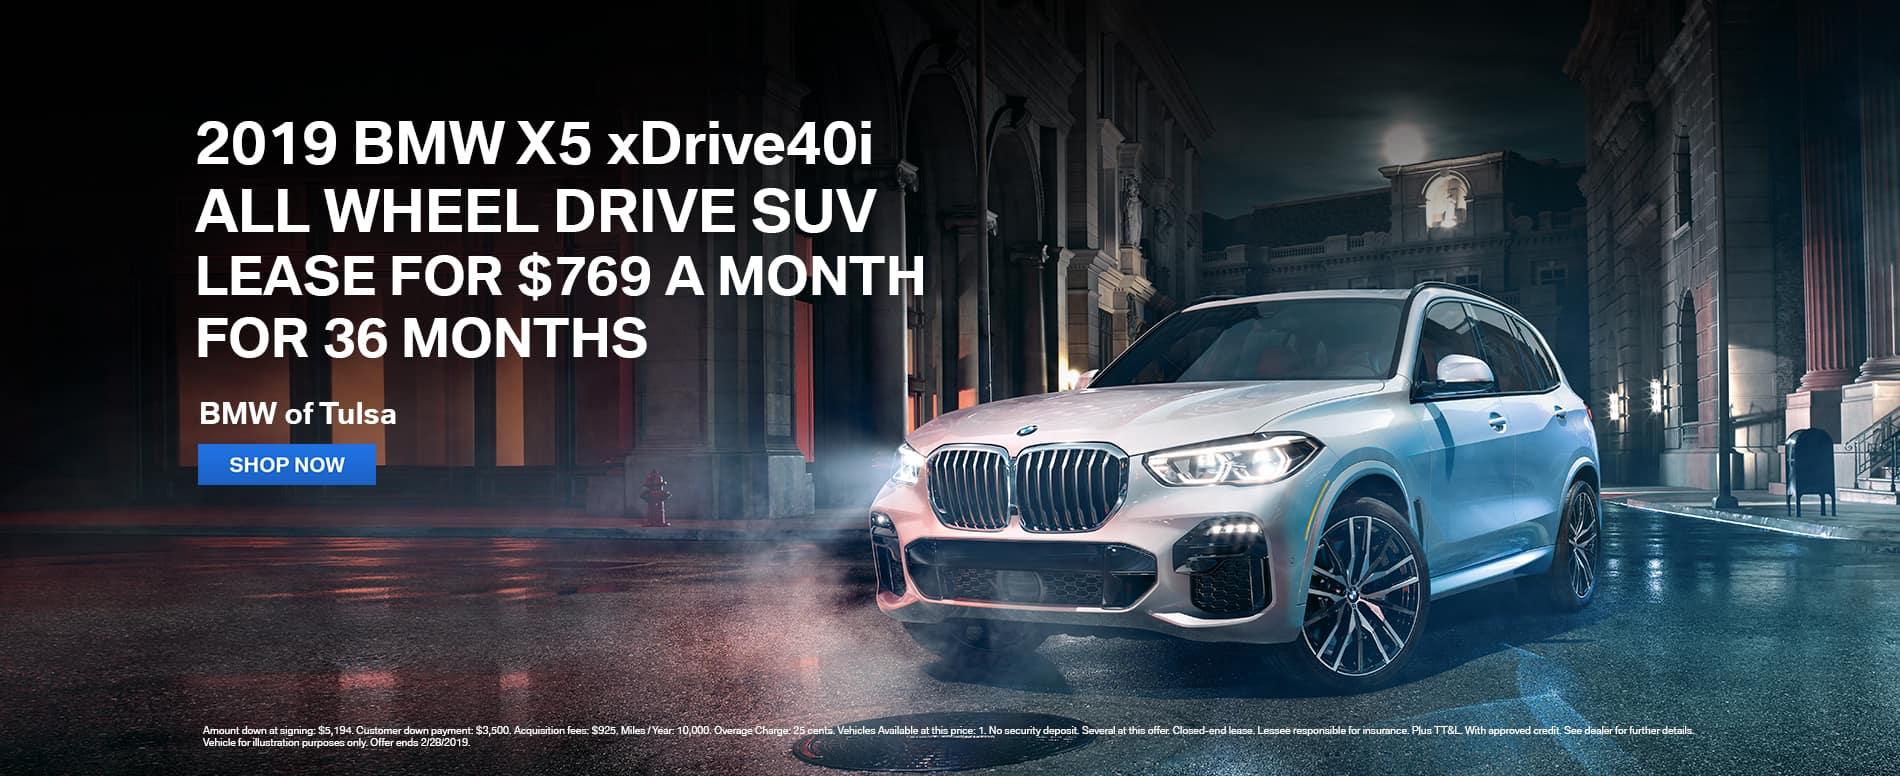 lease-2019-bmw-x5-xdrive40i-awd-suv-tulsa